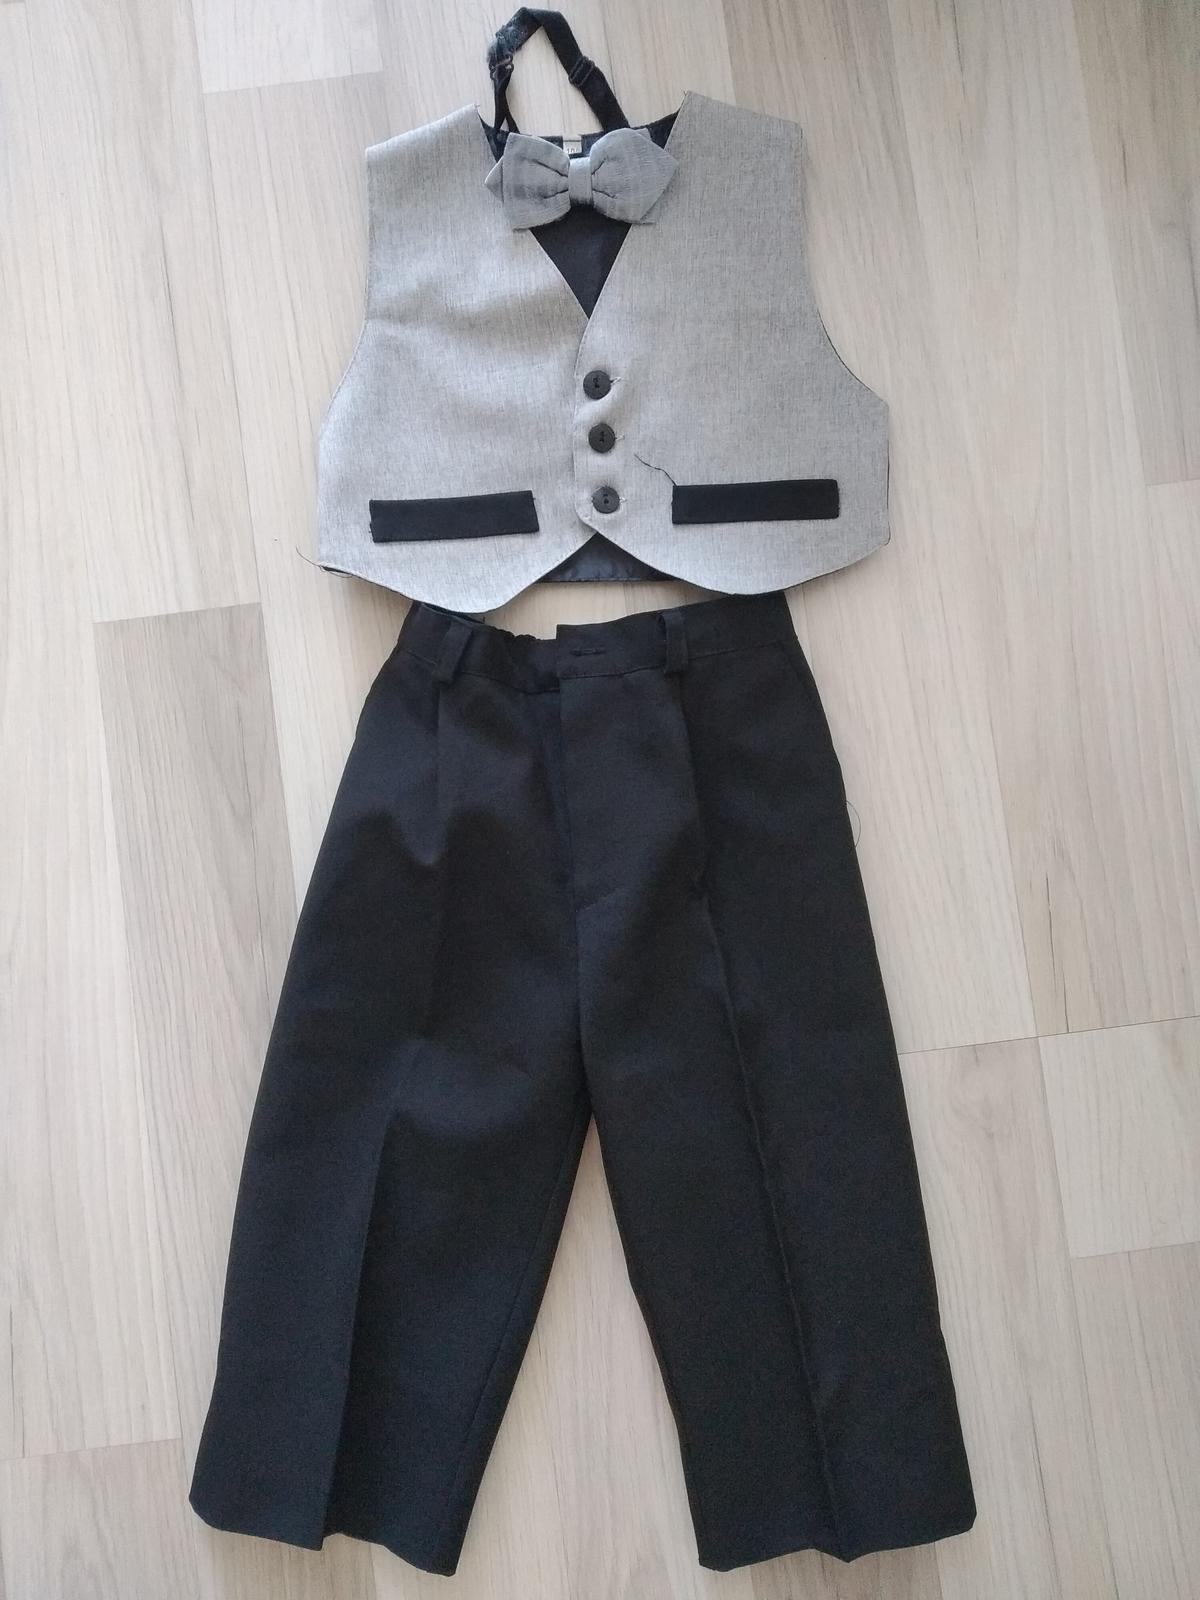 Kalhoty, vesta, motýlek - Obrázek č. 1